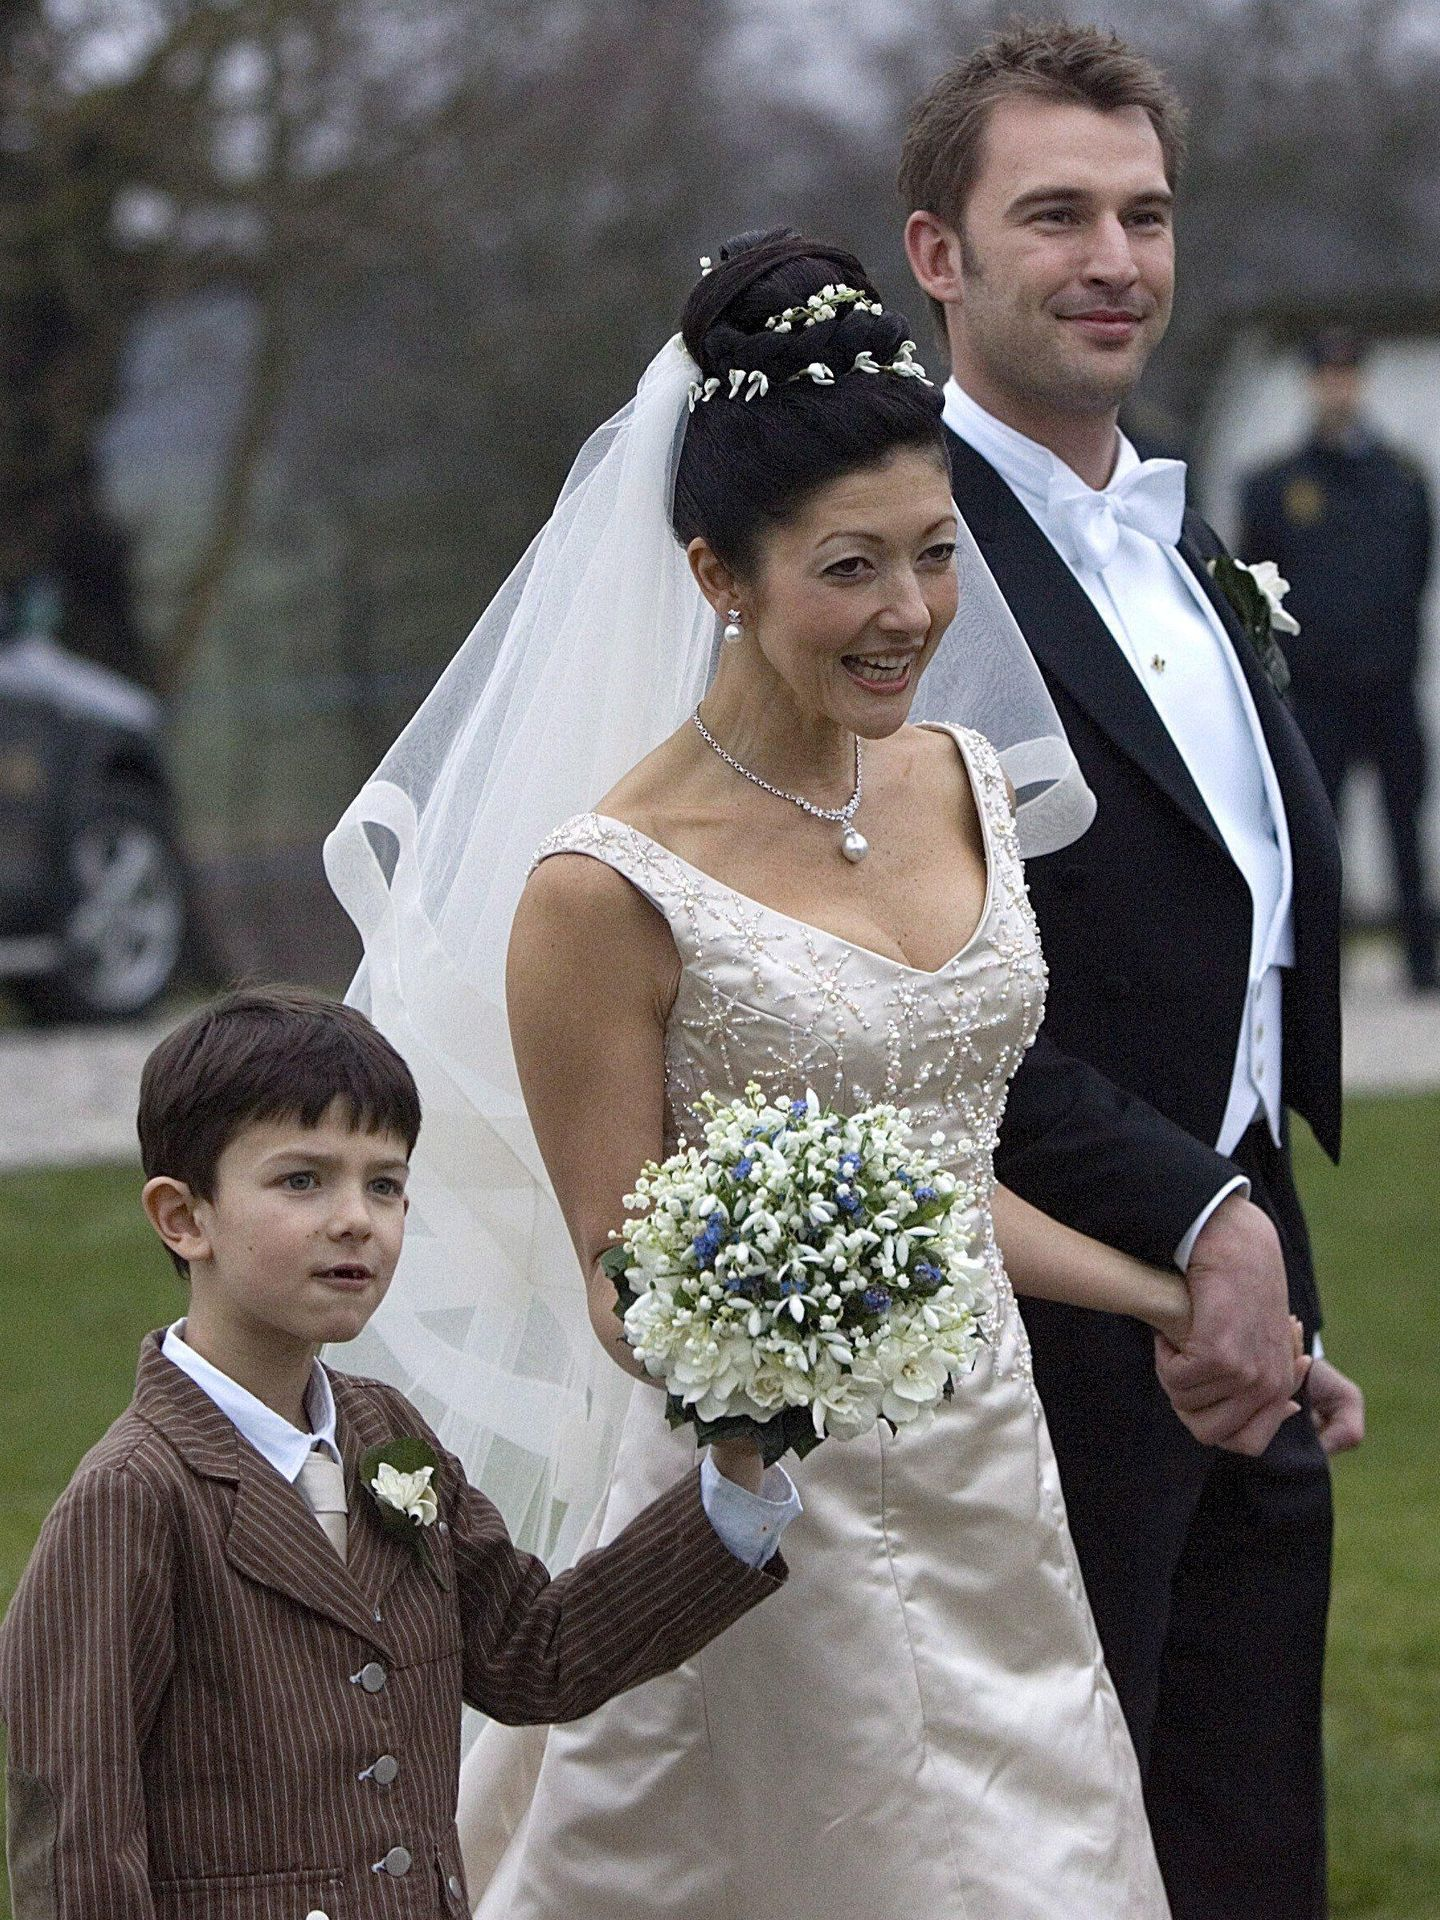 Alexandra, en su boda con el fotógrafo Martin Jørgensen. (Cordon Press)